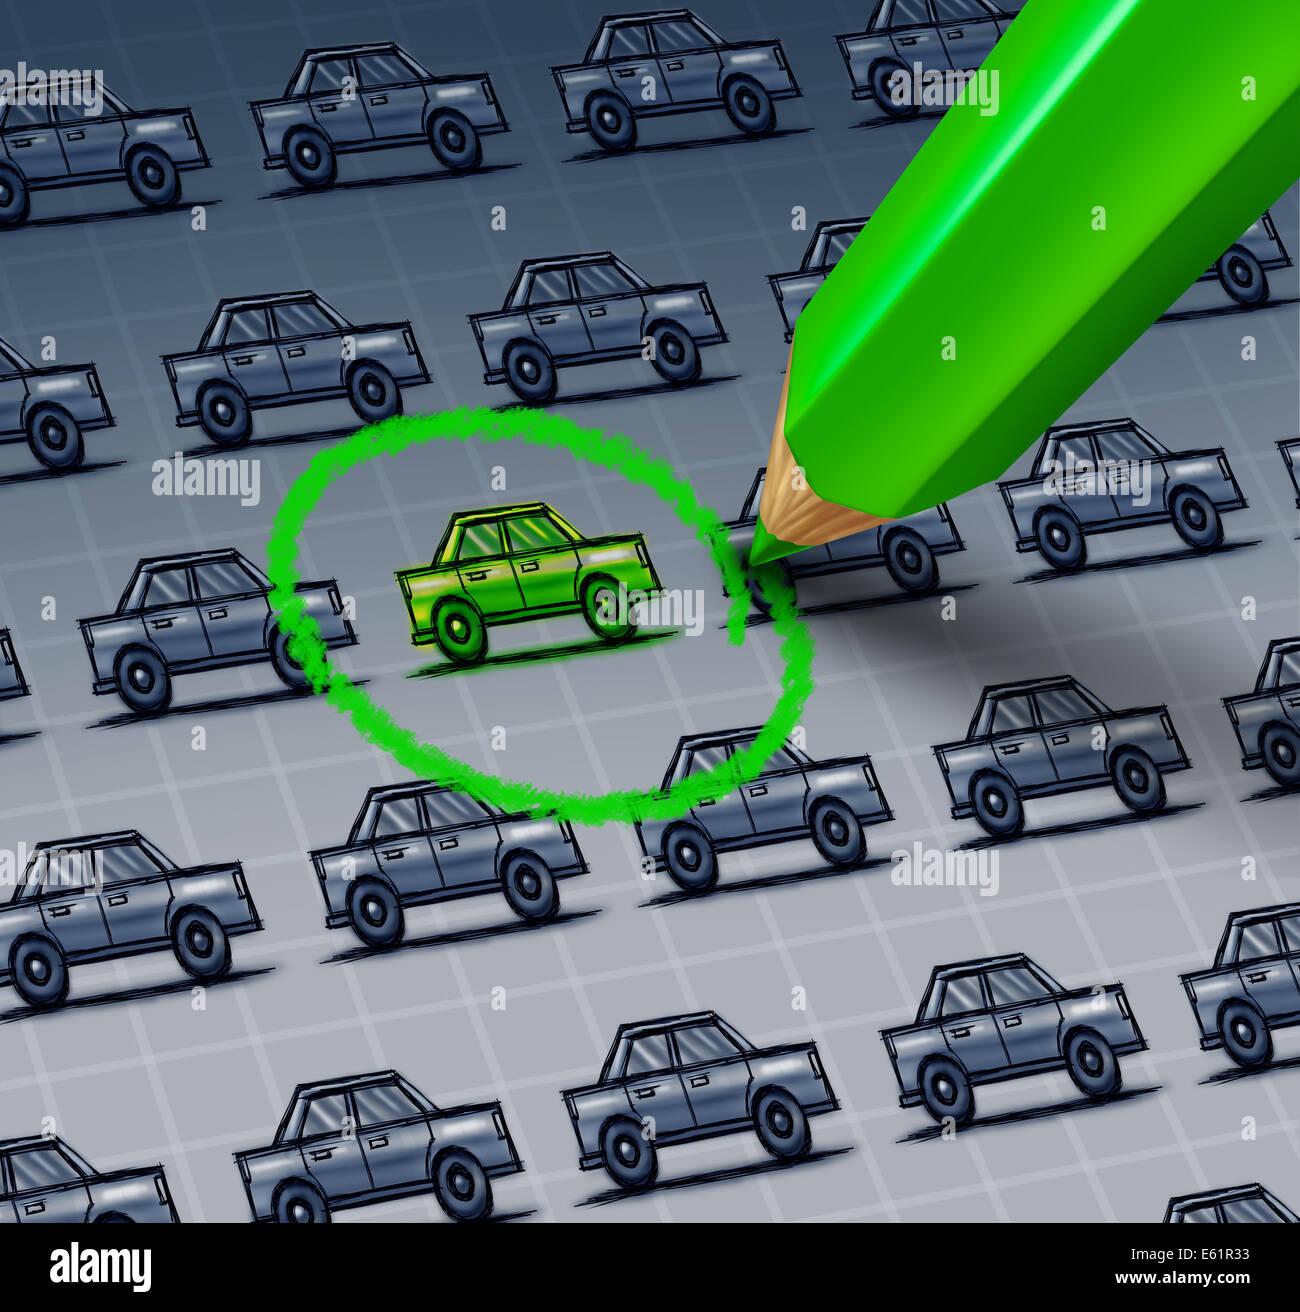 Coche verde elección concepto como un dibujo de un grupo de automóviles con un lápiz verde dibujando Imagen De Stock